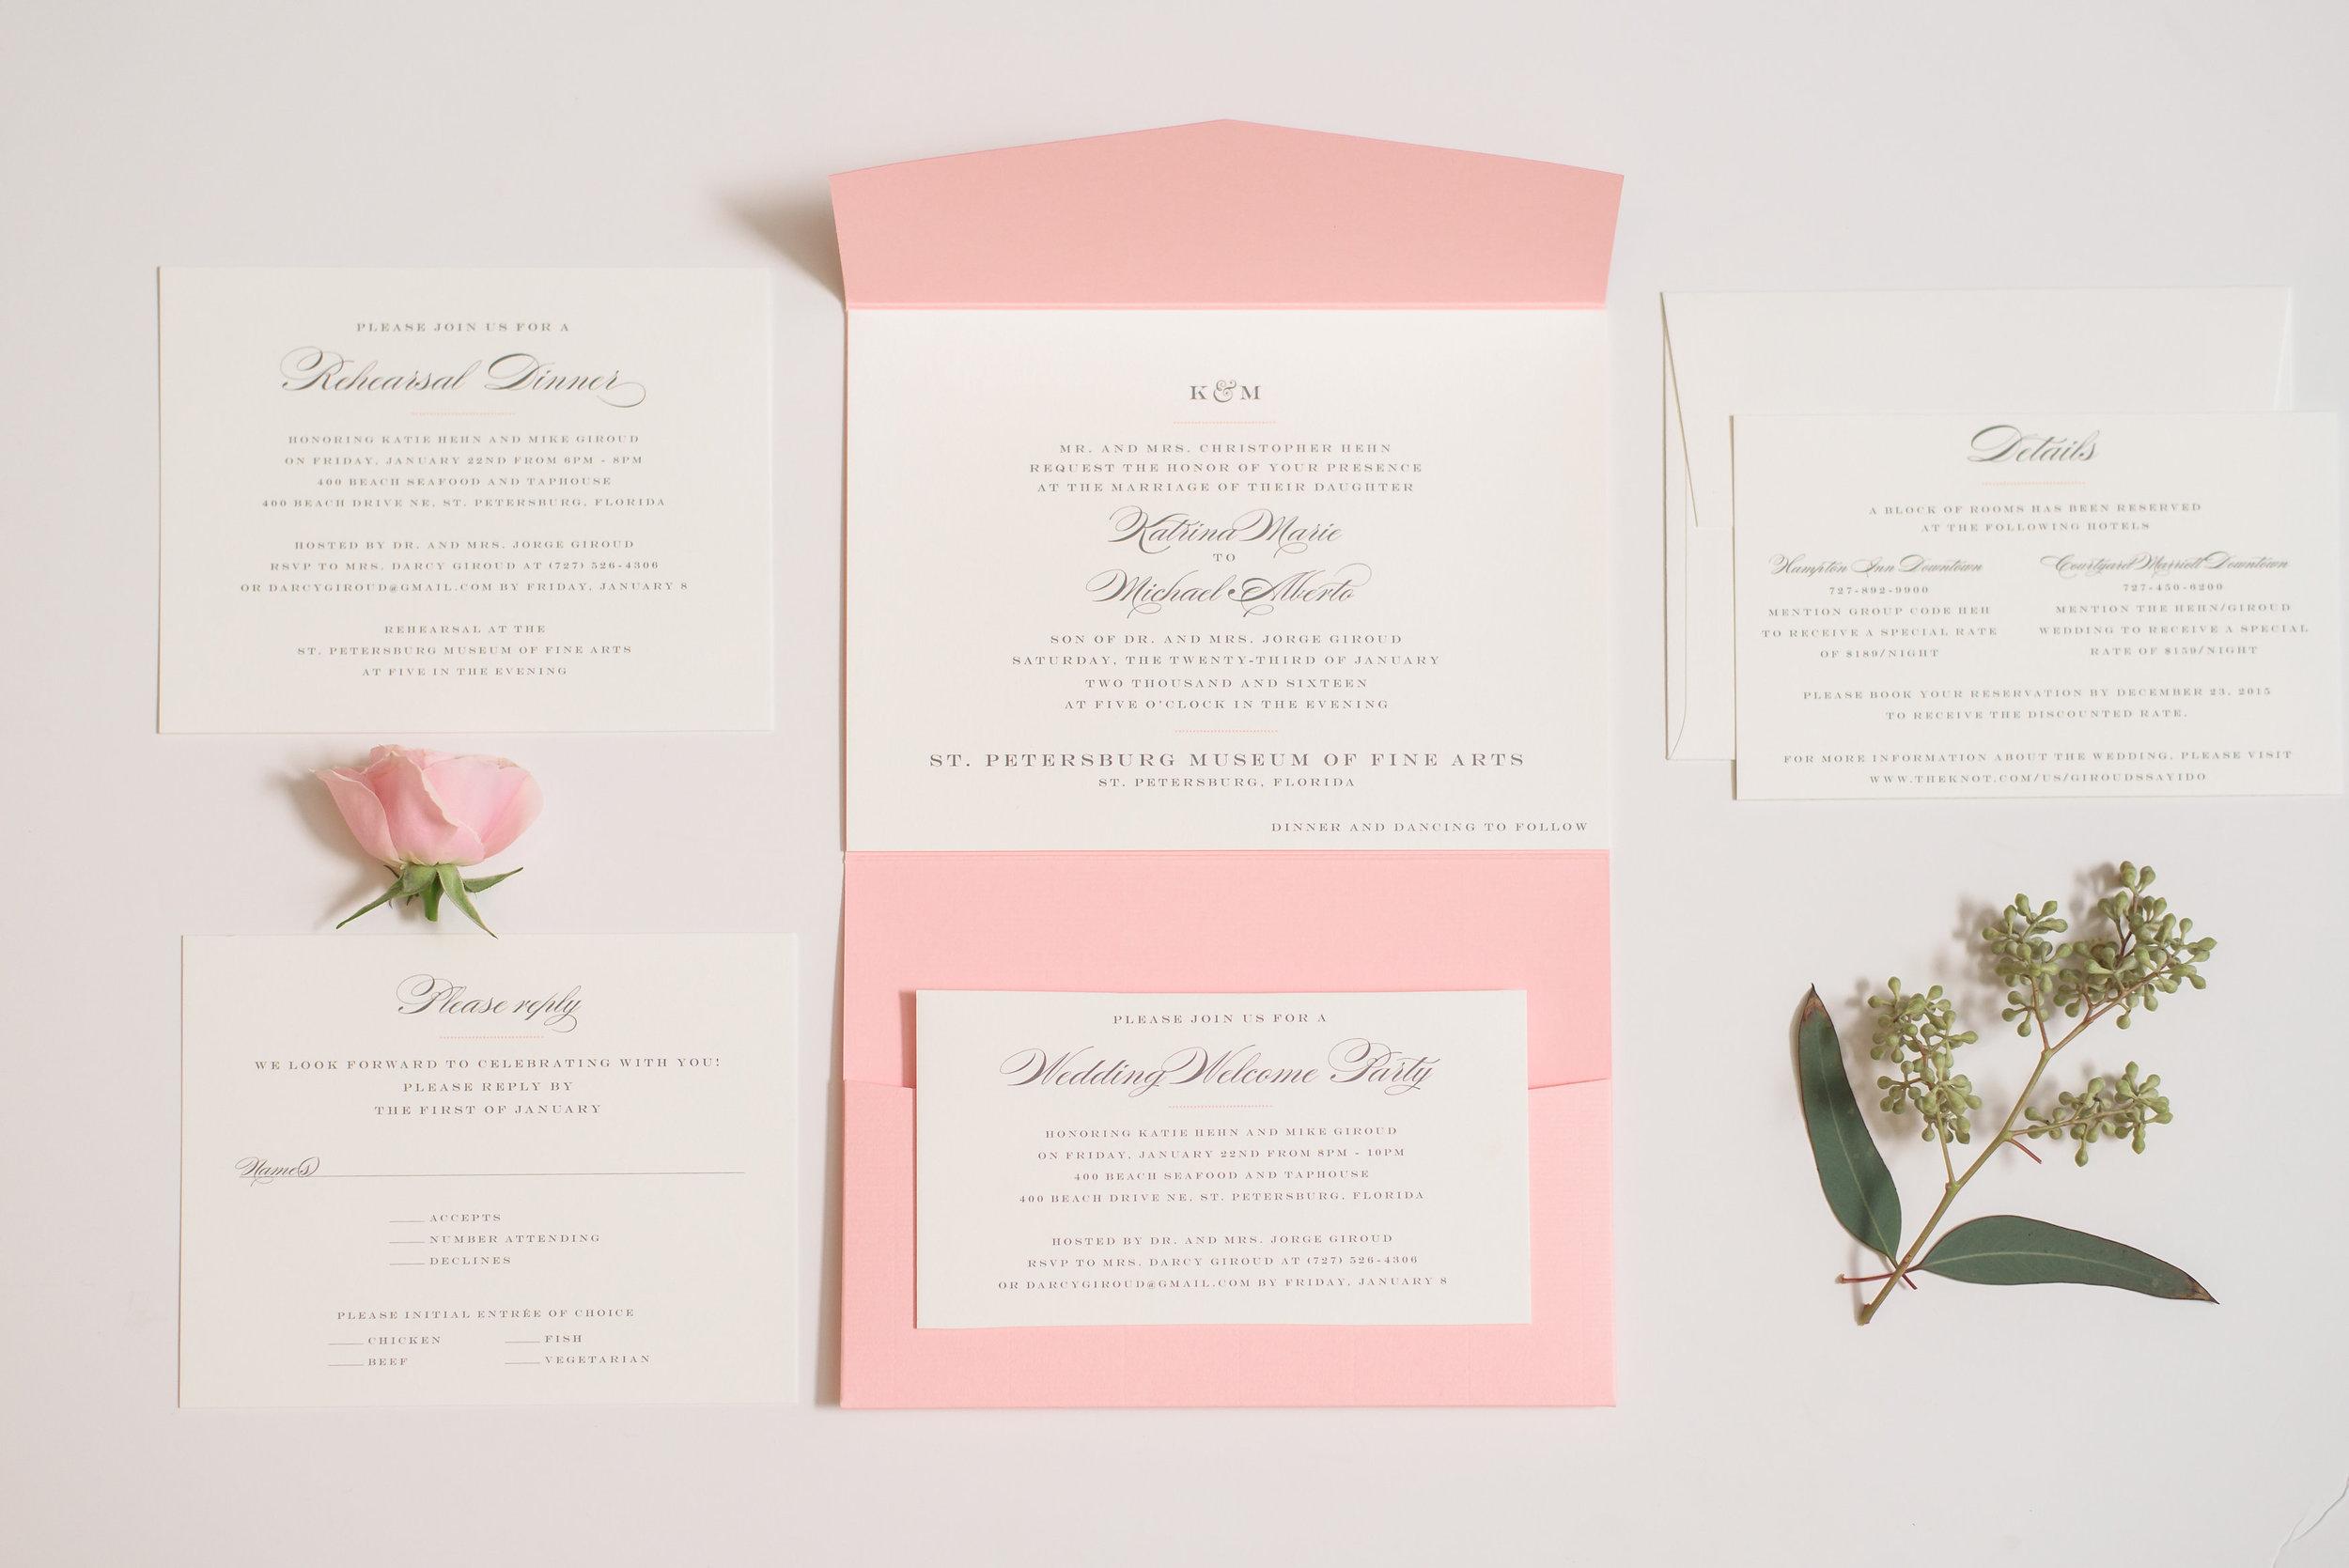 winsor event studio pocket invitation blush